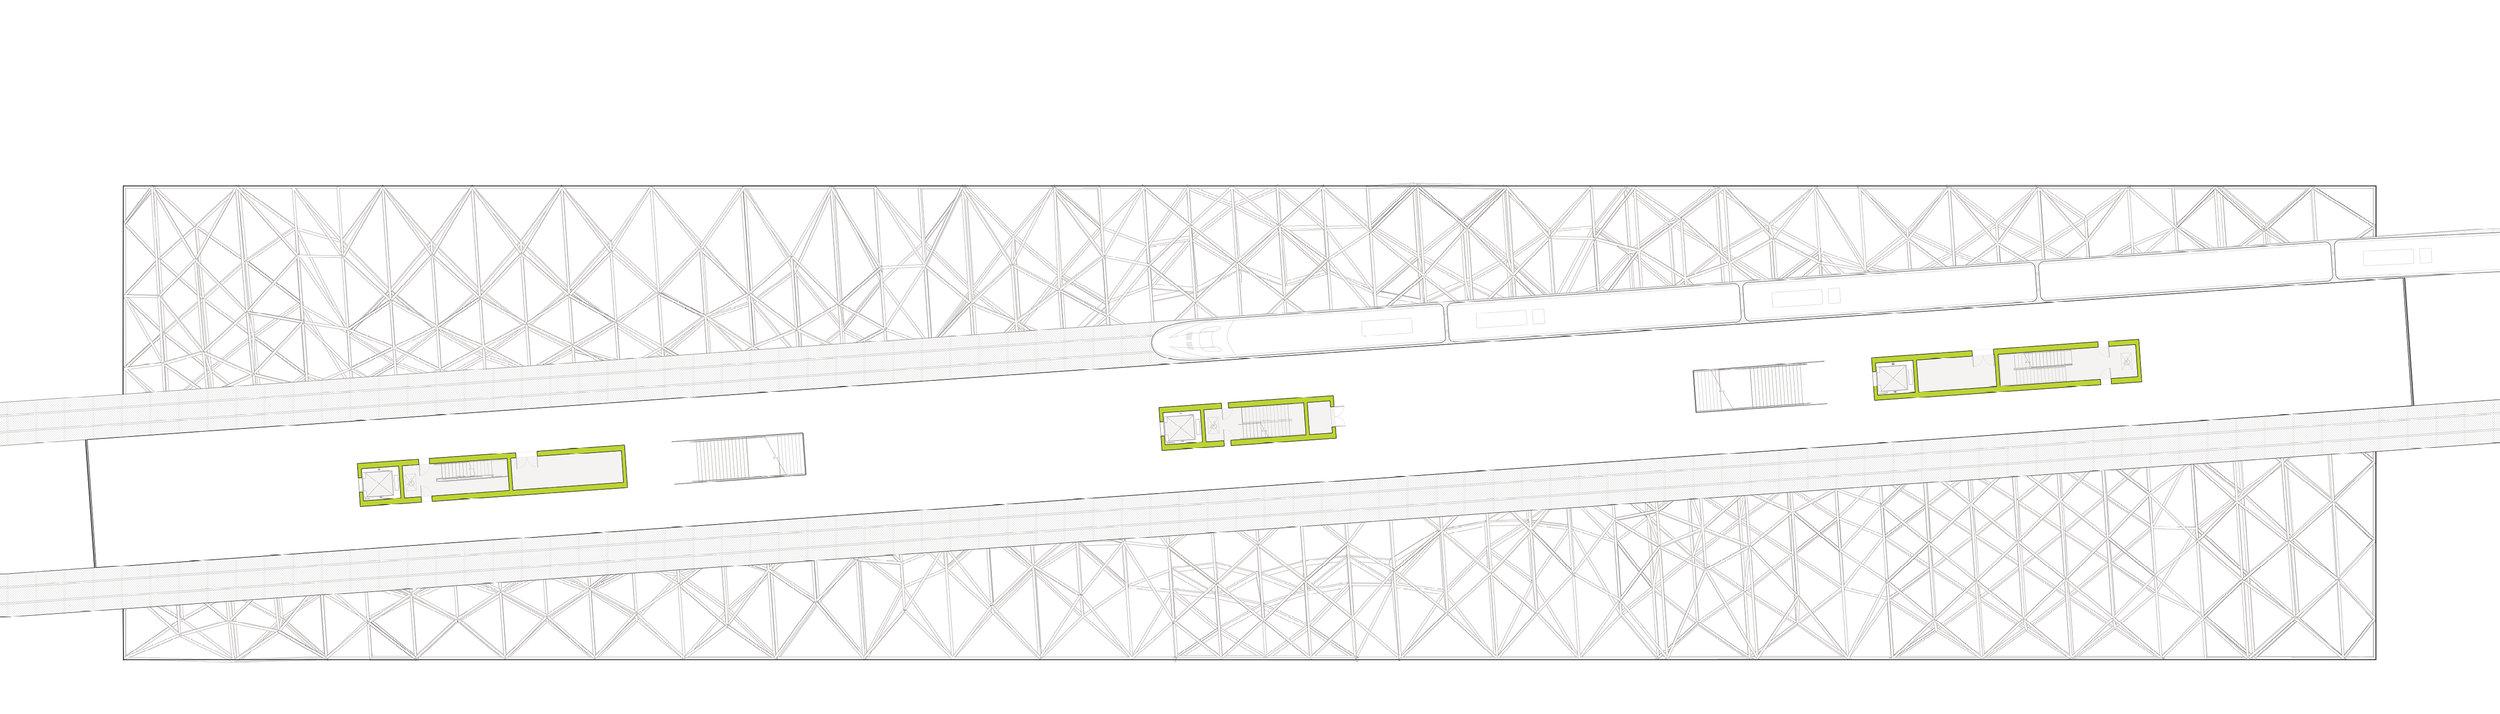 181122_platform level.jpg